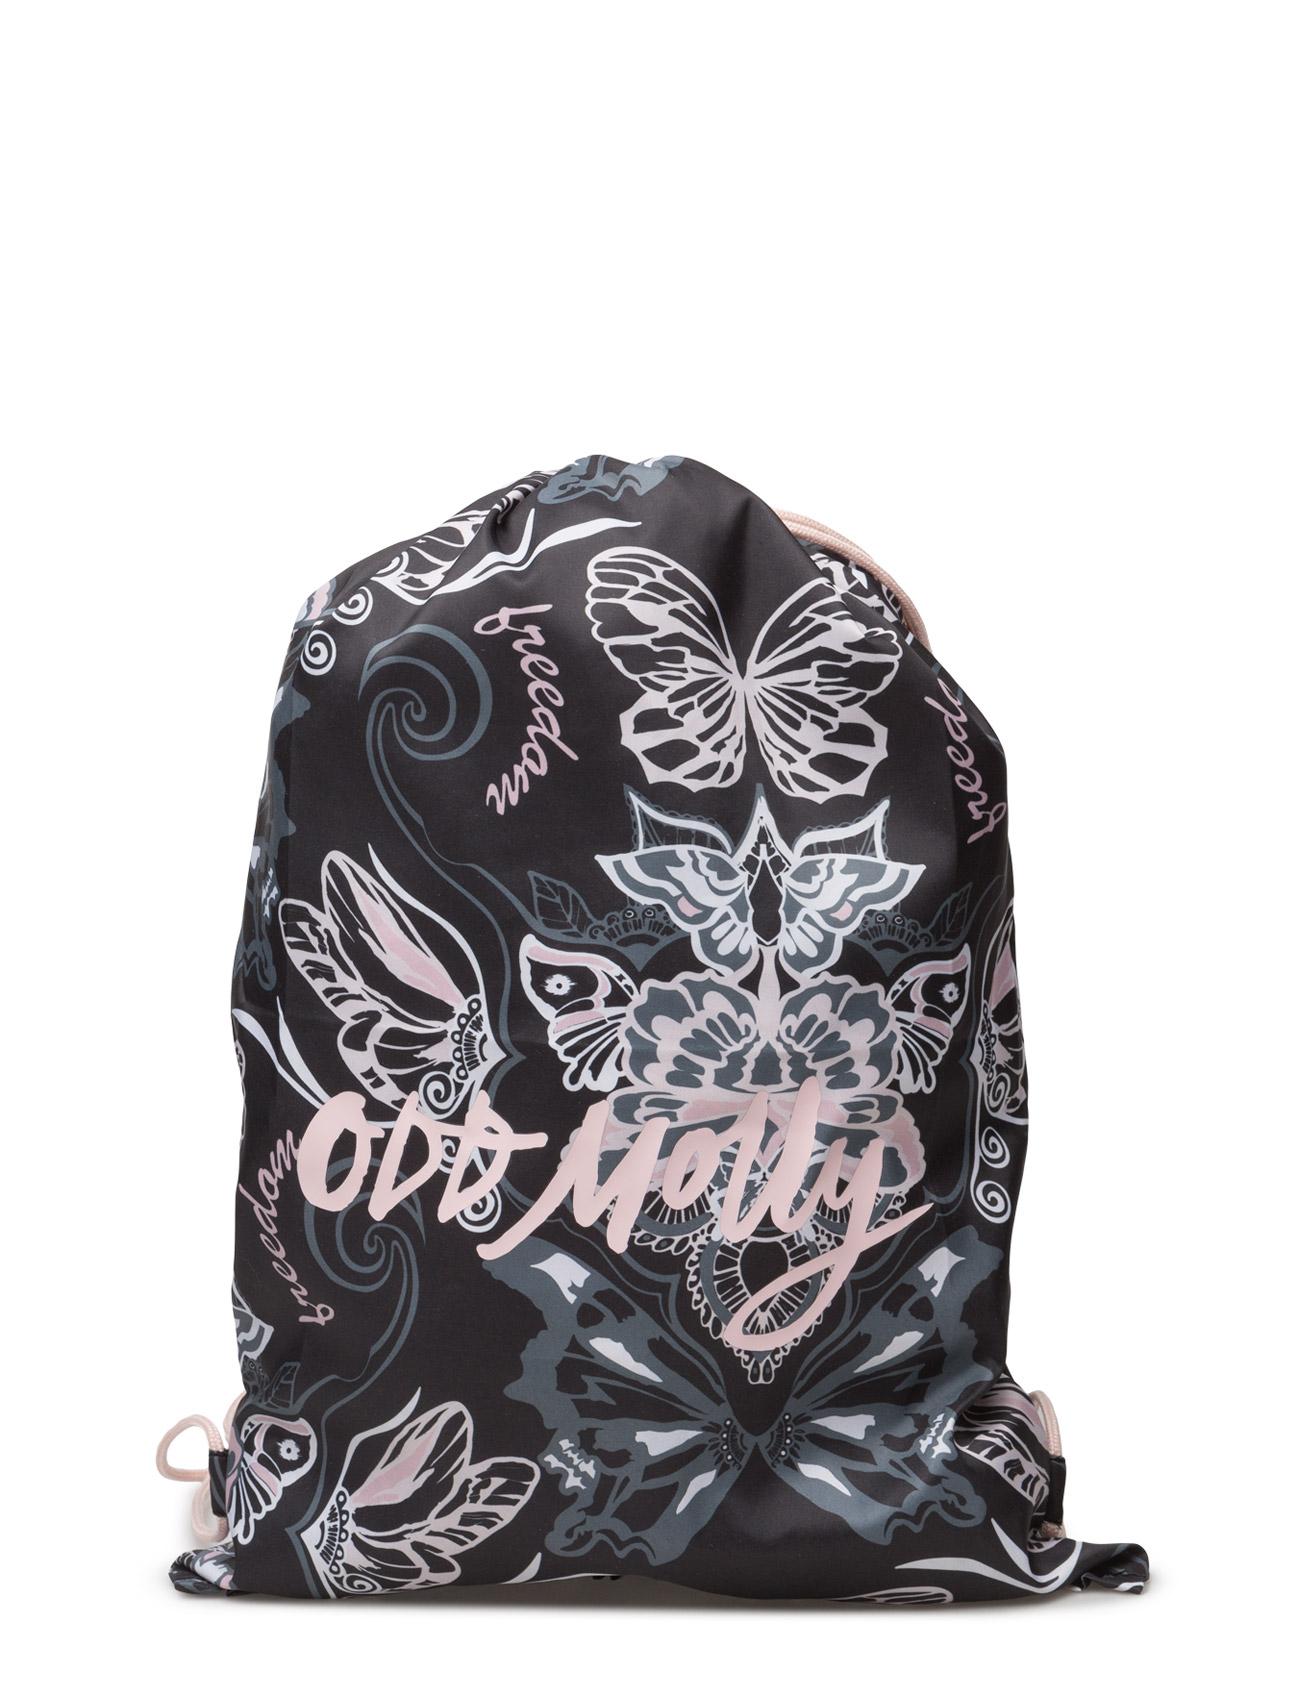 odd molly active wear Upbeat back packer fra boozt.com dk